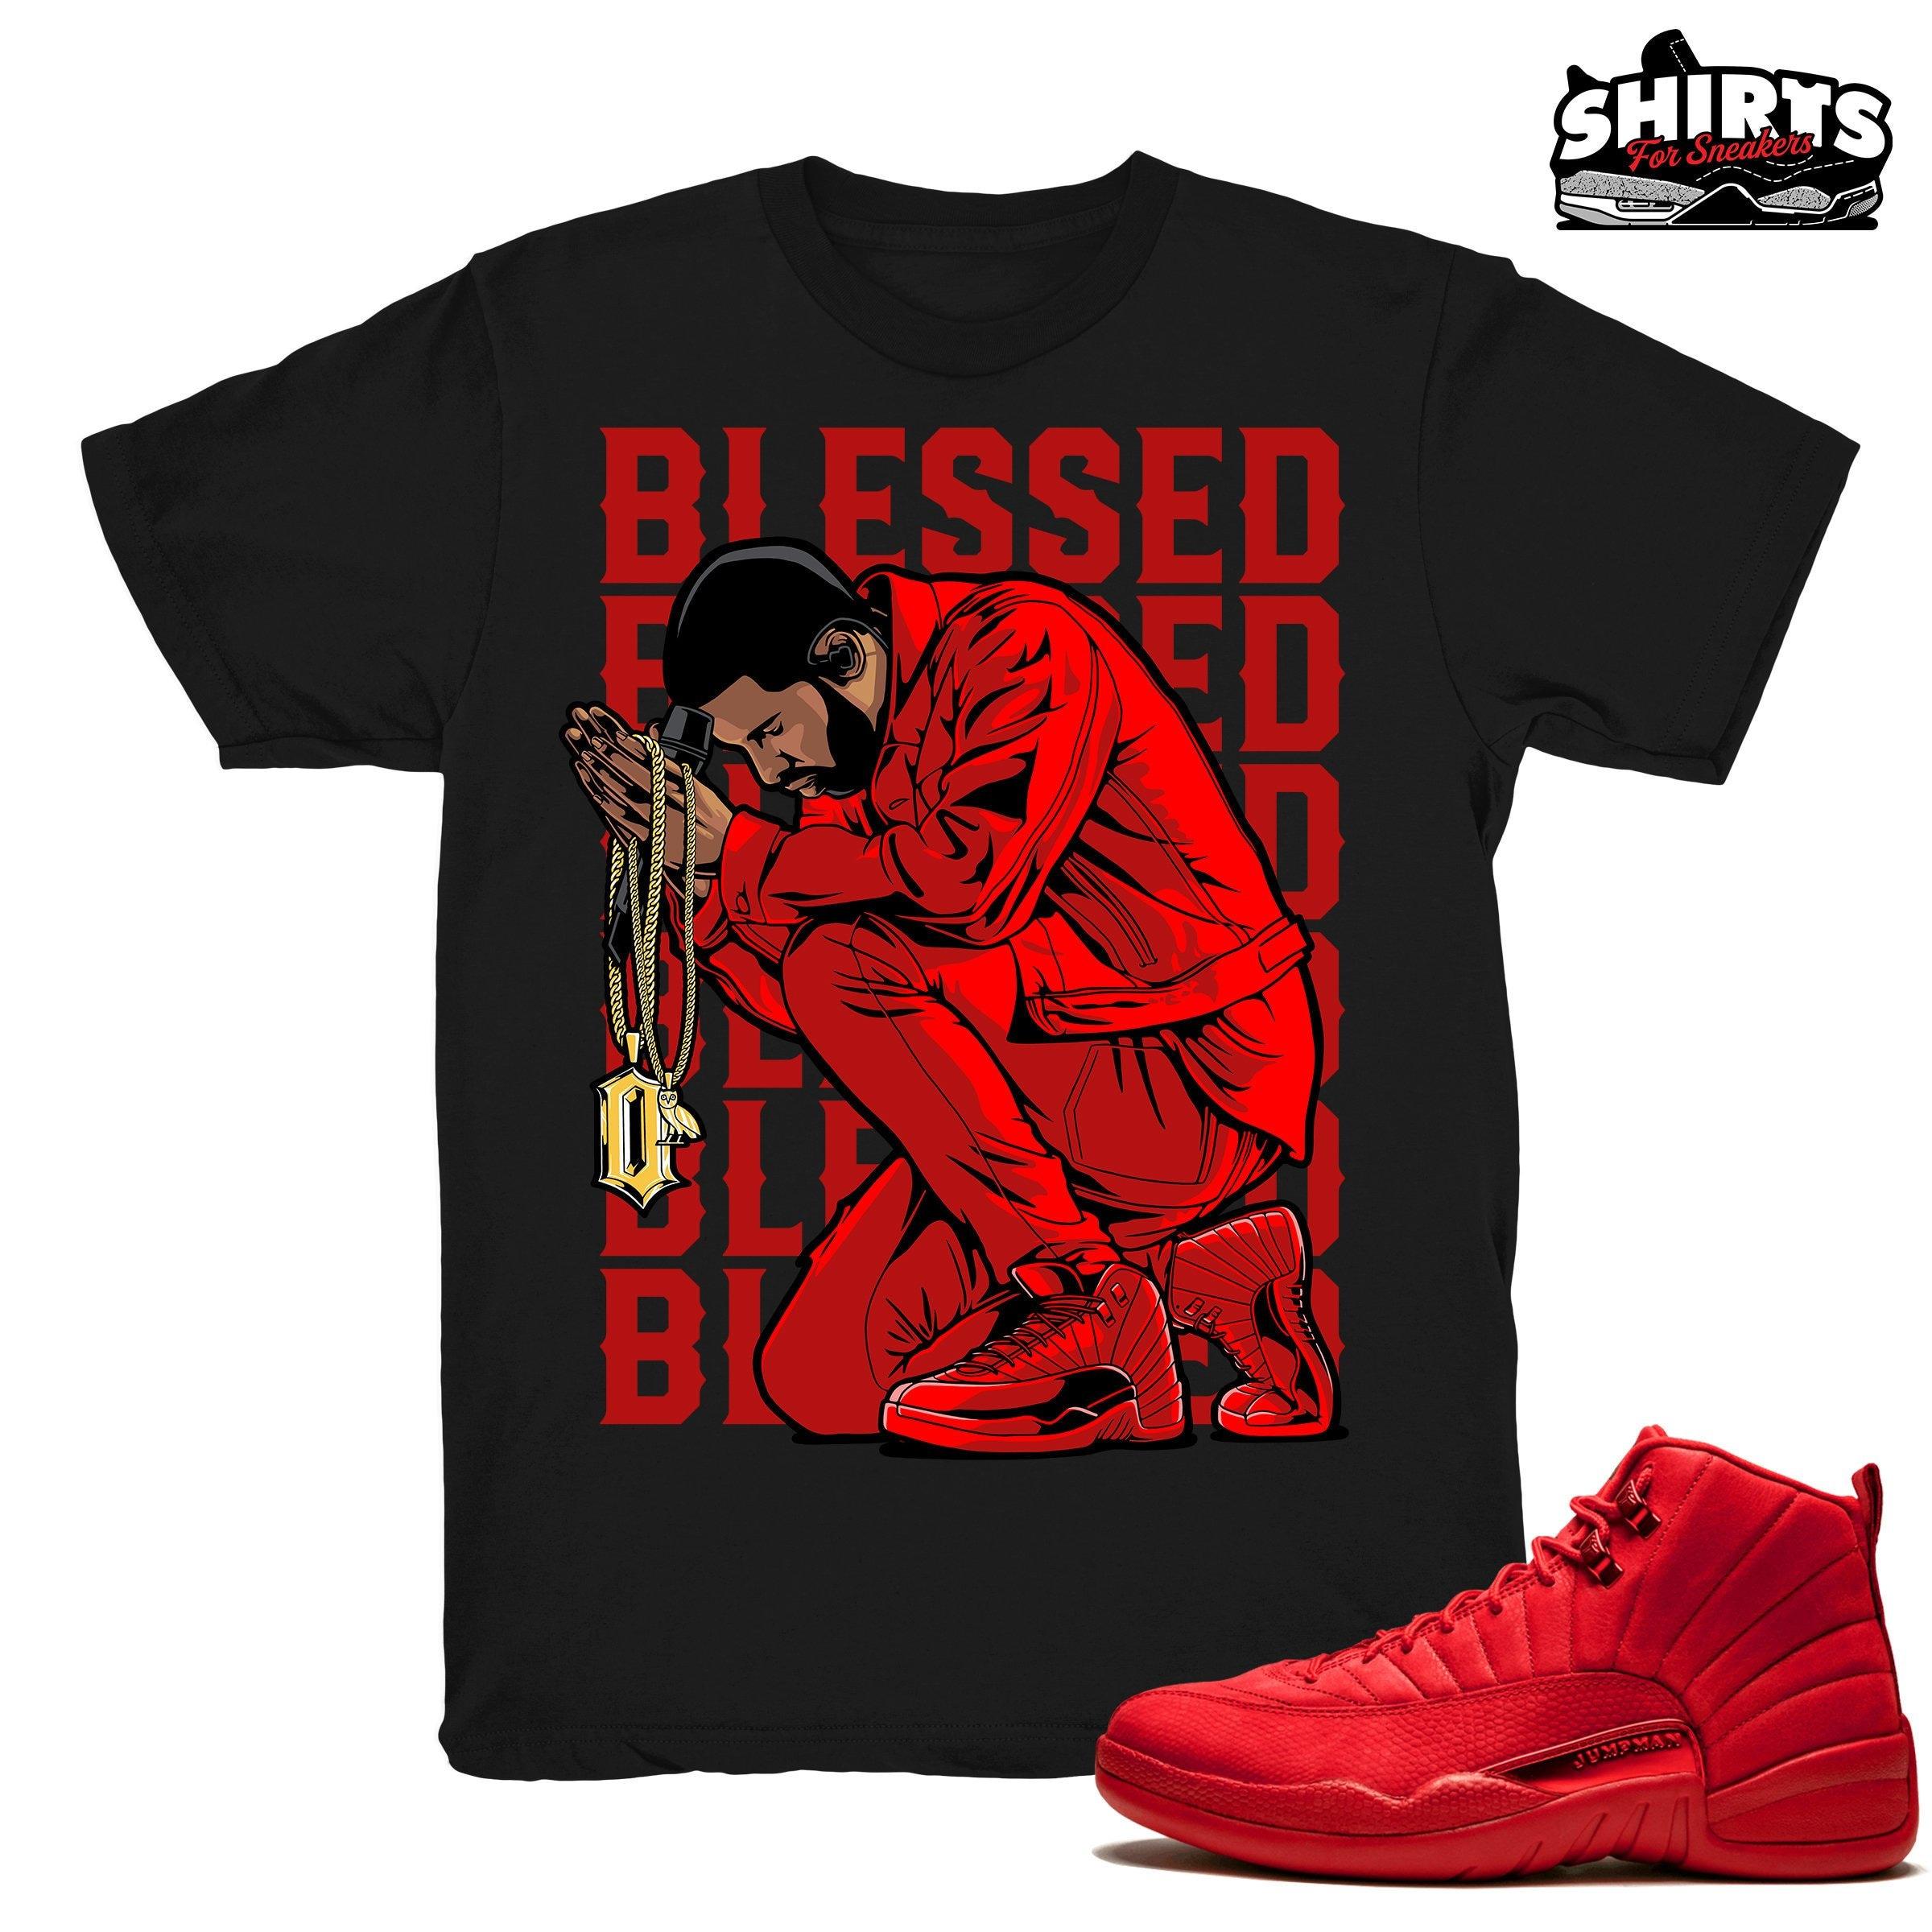 buy online d653d 463b9 Air Jordan 12 Gym Red shirt | Drake Blessed - Retro 12 Gym Red 2018 / Black  tee shirts